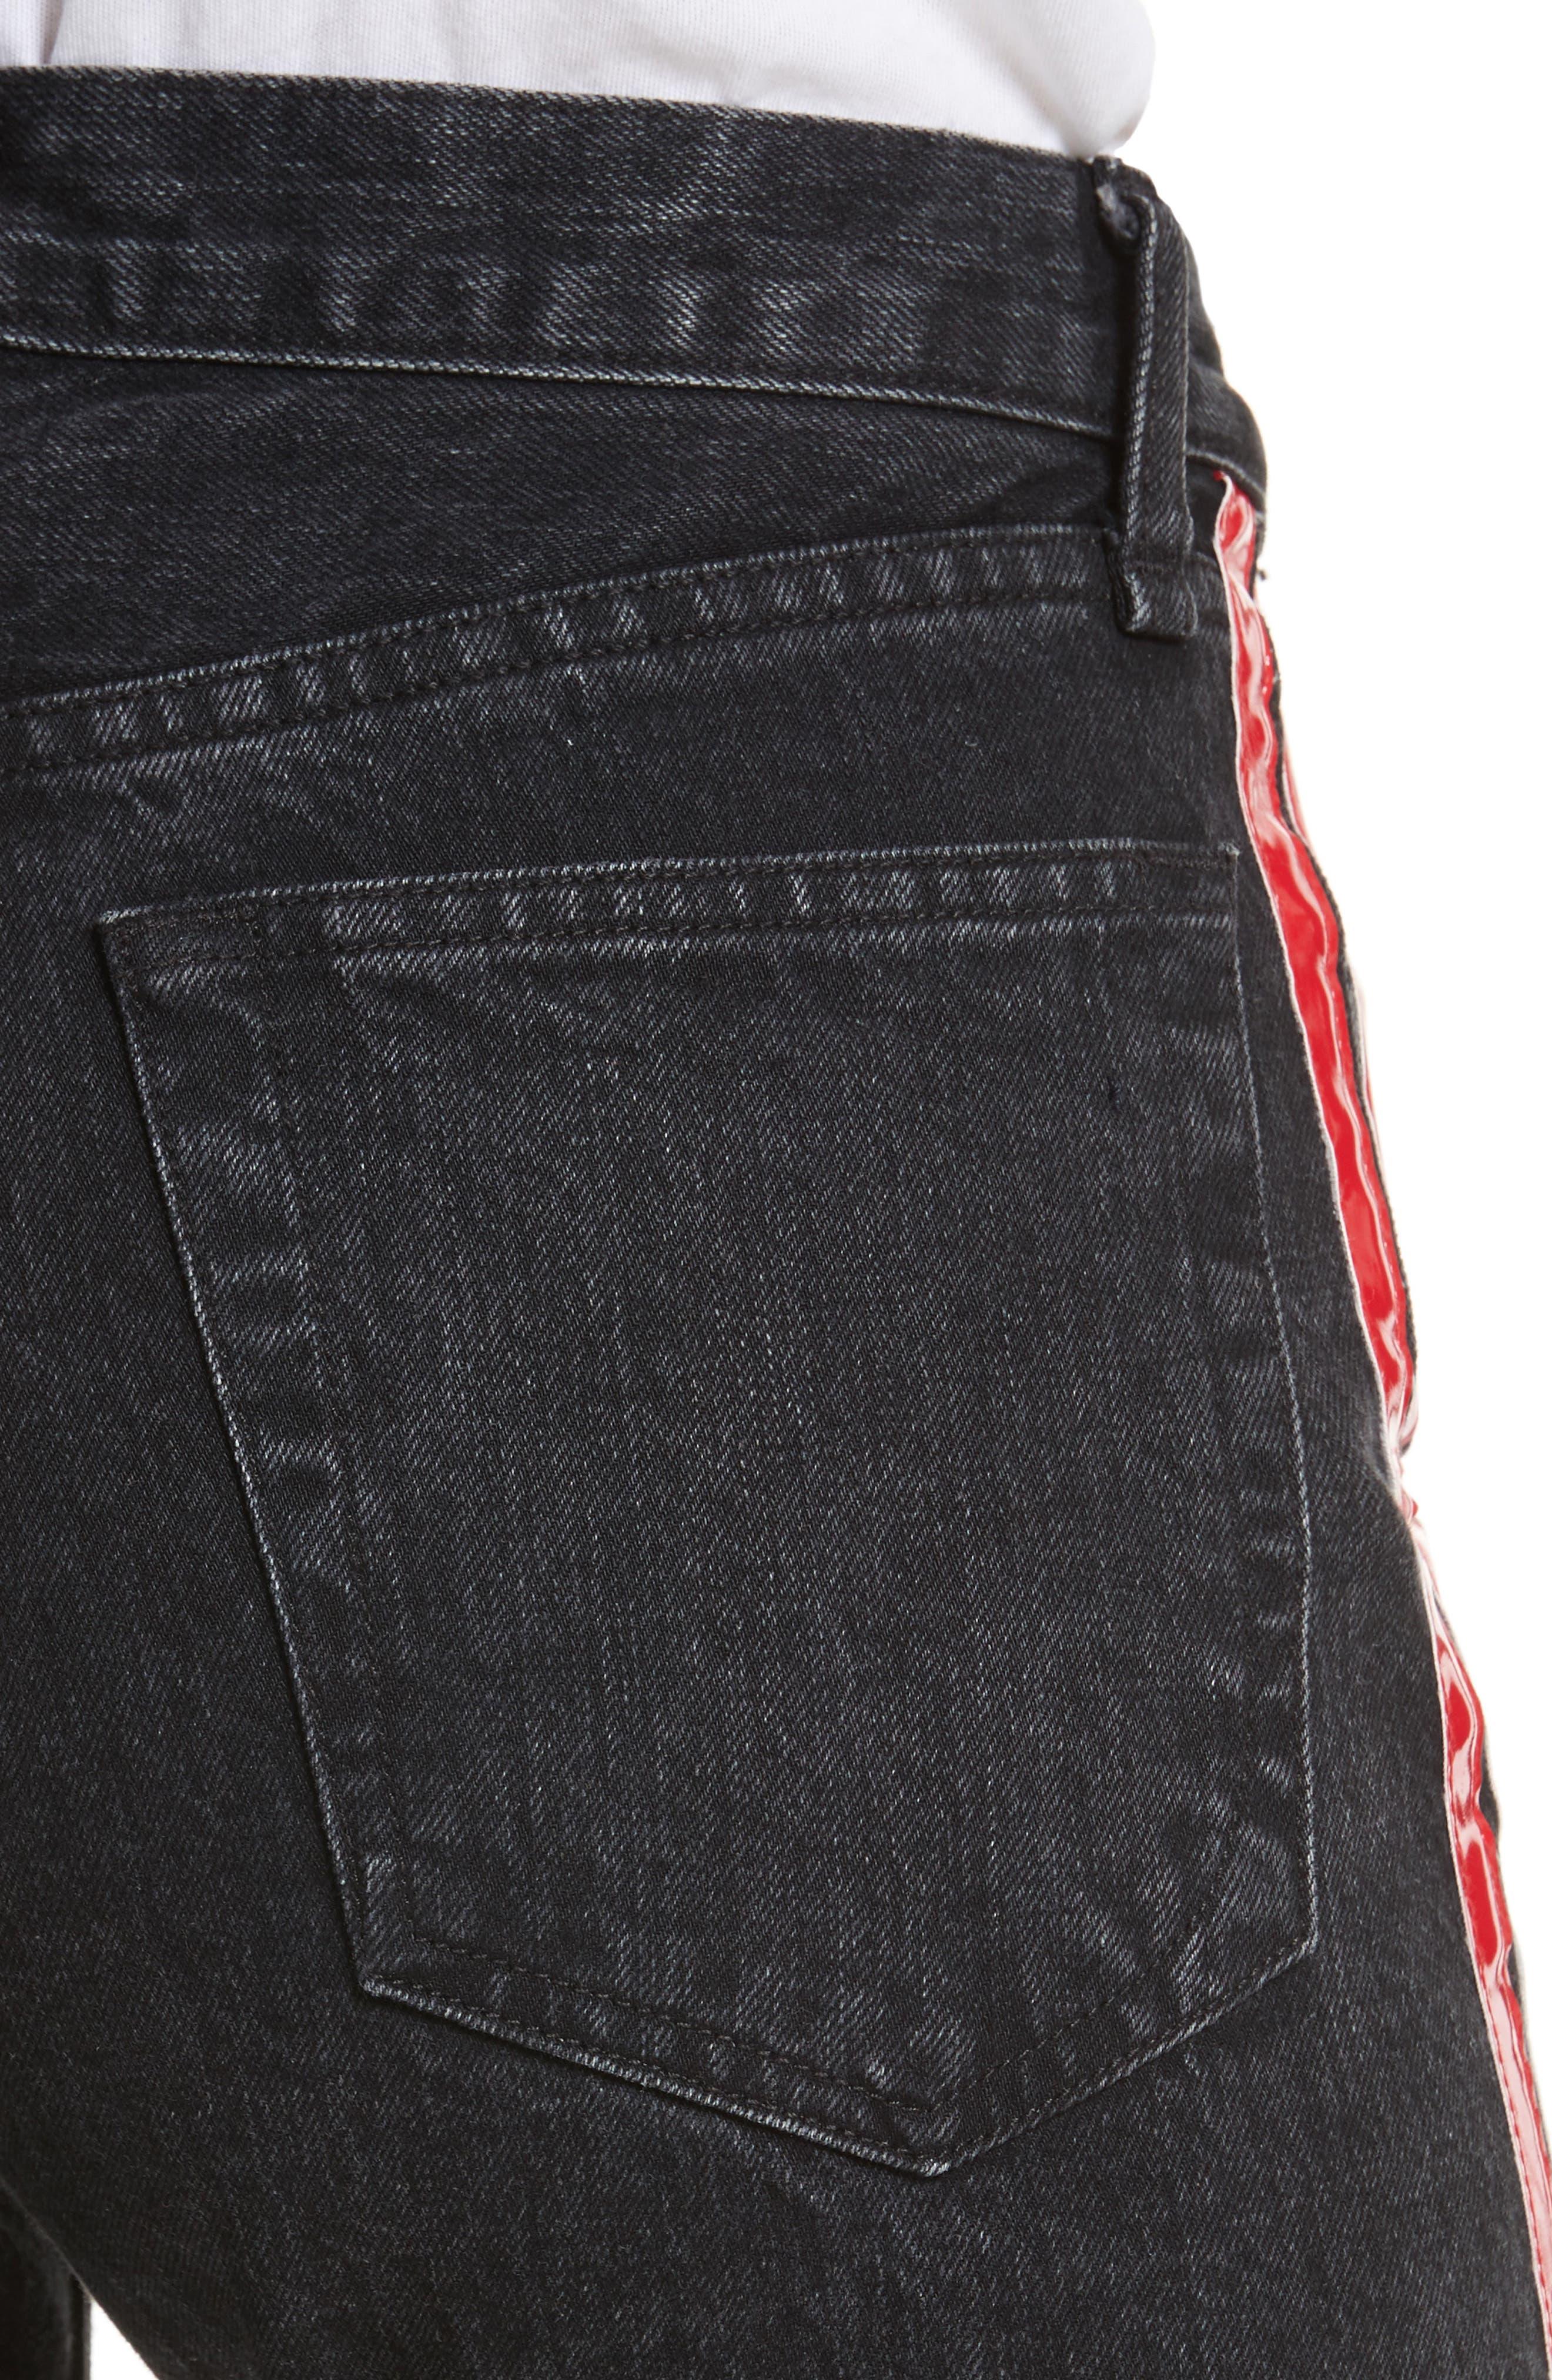 High Waist Straight Leg Jeans,                             Alternate thumbnail 4, color,                             001